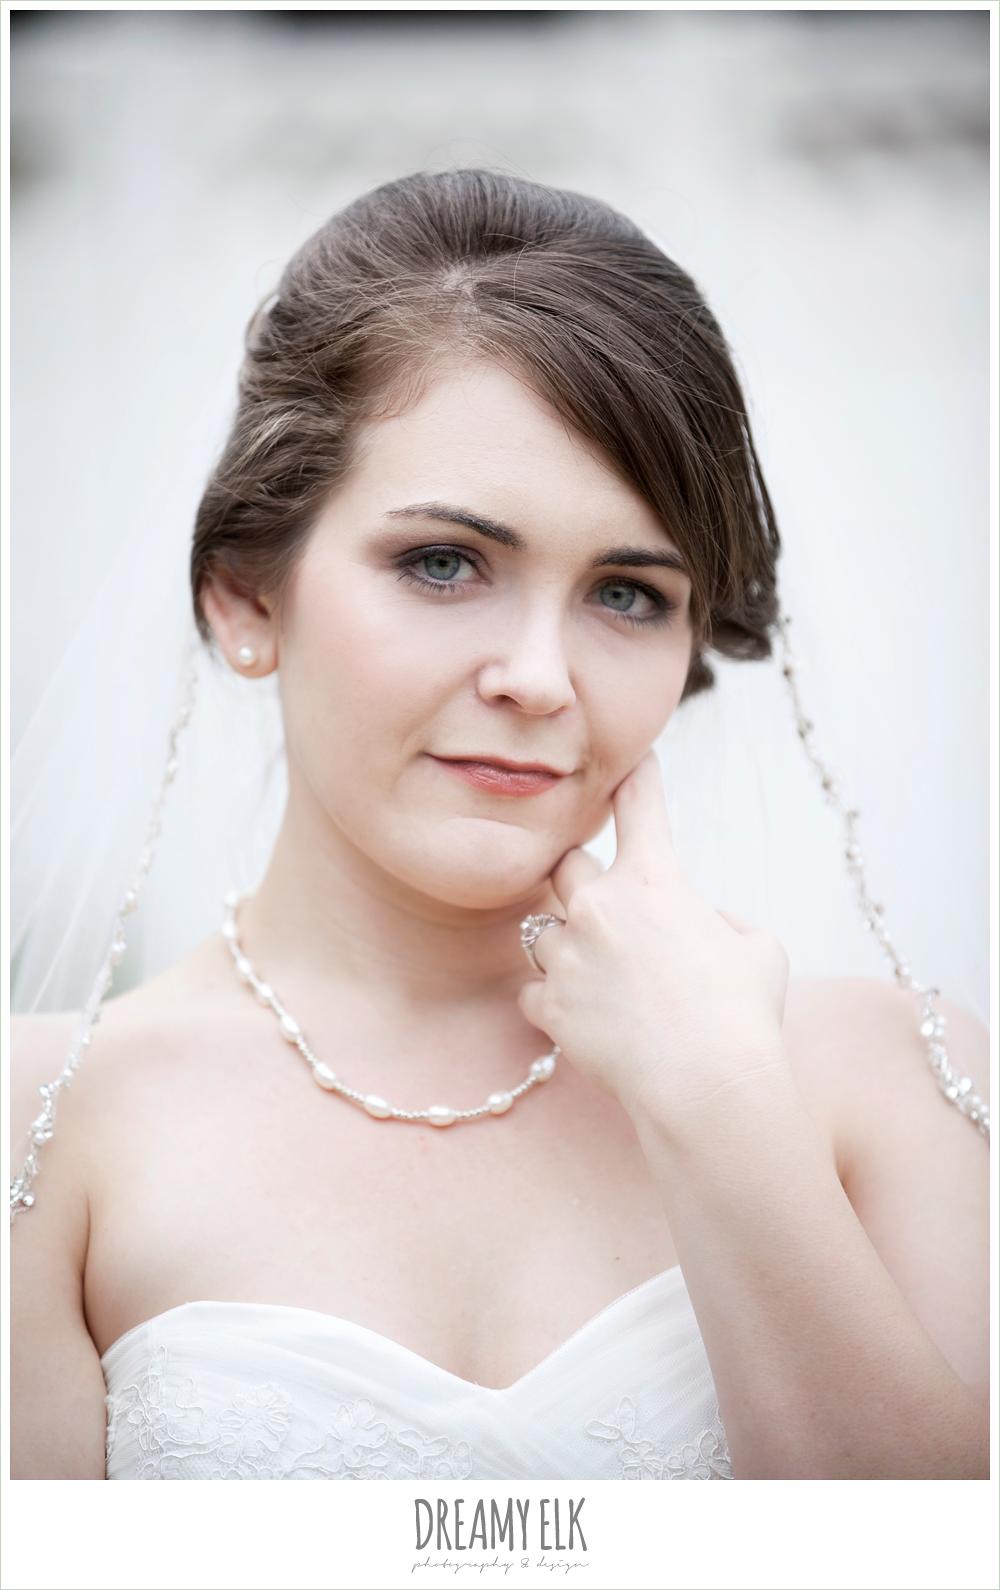 sweetheart strapless lace wedding dress, beaded veil